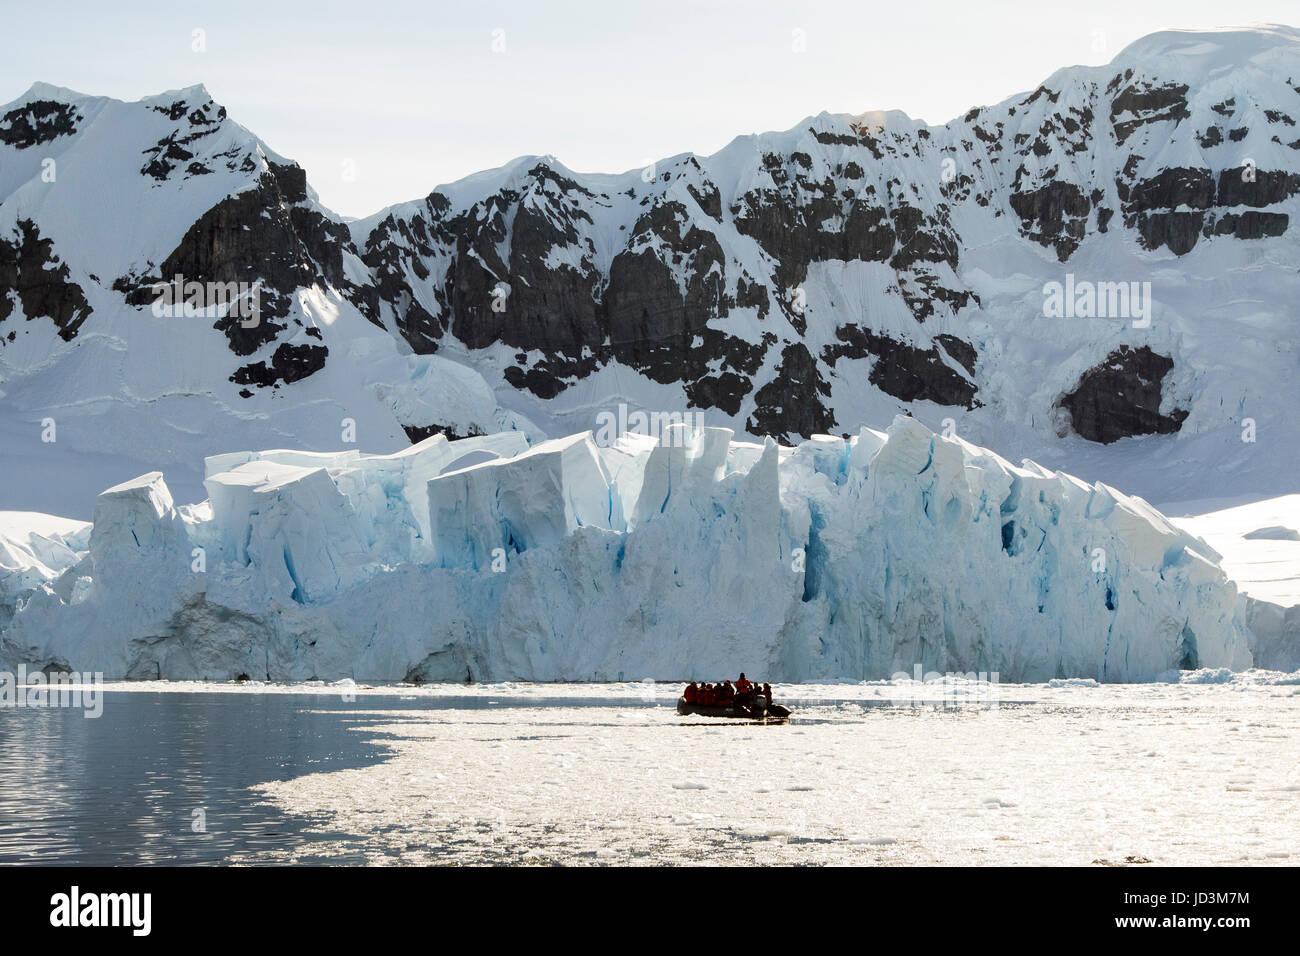 Cruise ship Antarctica expedition with tourists view Antarctic landscape,  Antarctic Peninsula. - Stock Image